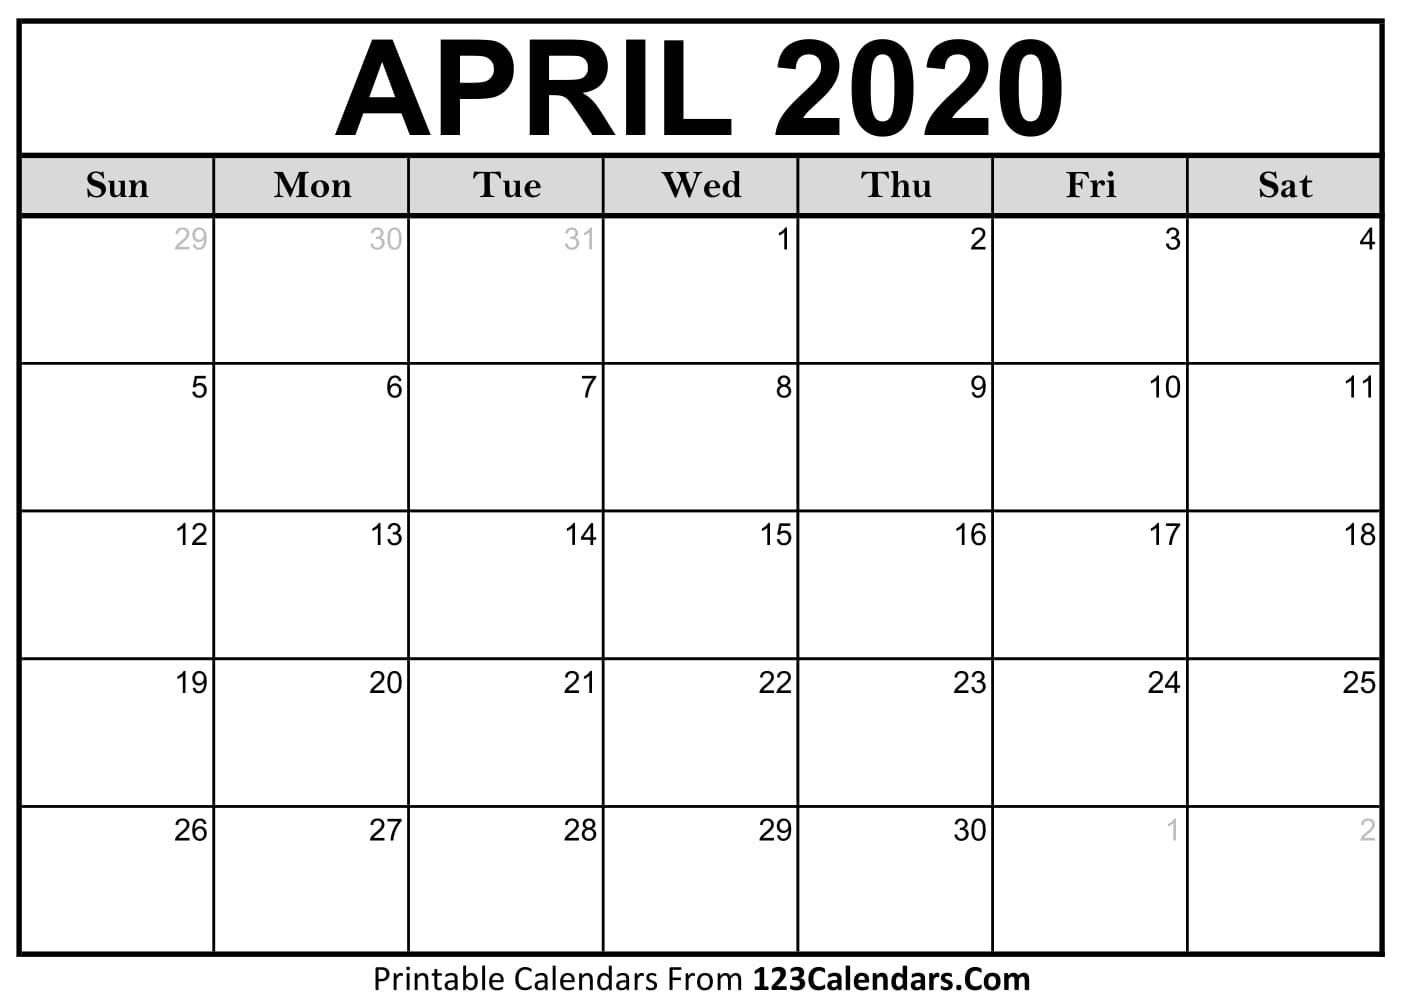 April 2020 Printable Calendar | 123Calendars